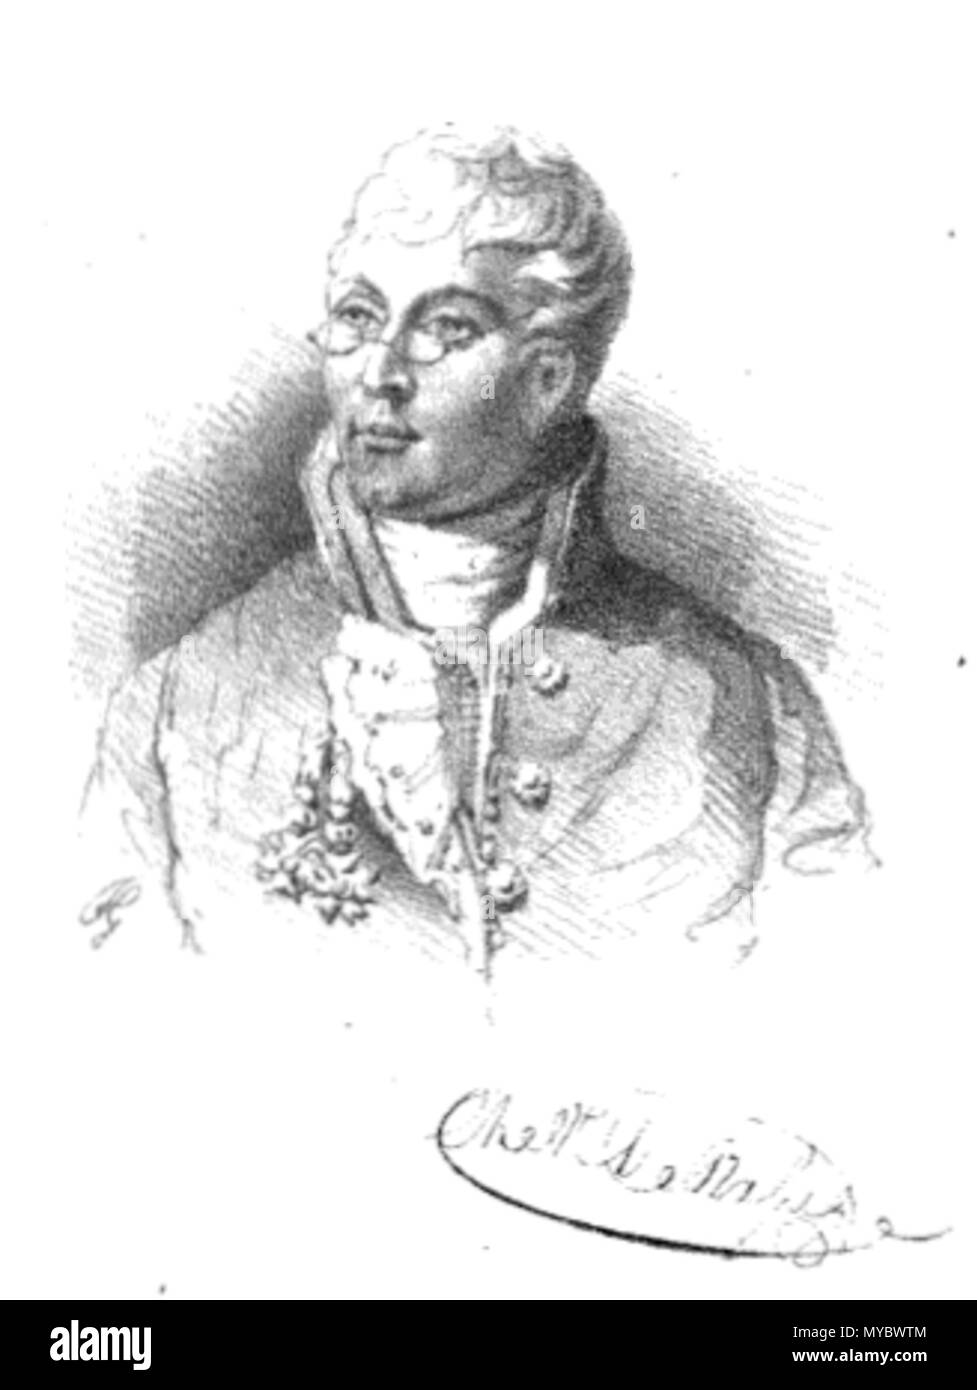 . English: Charles Henri Joseph de Rasse (1774-1818) . 19th century. Unknown 107 Charleshenriderasse - Stock Image